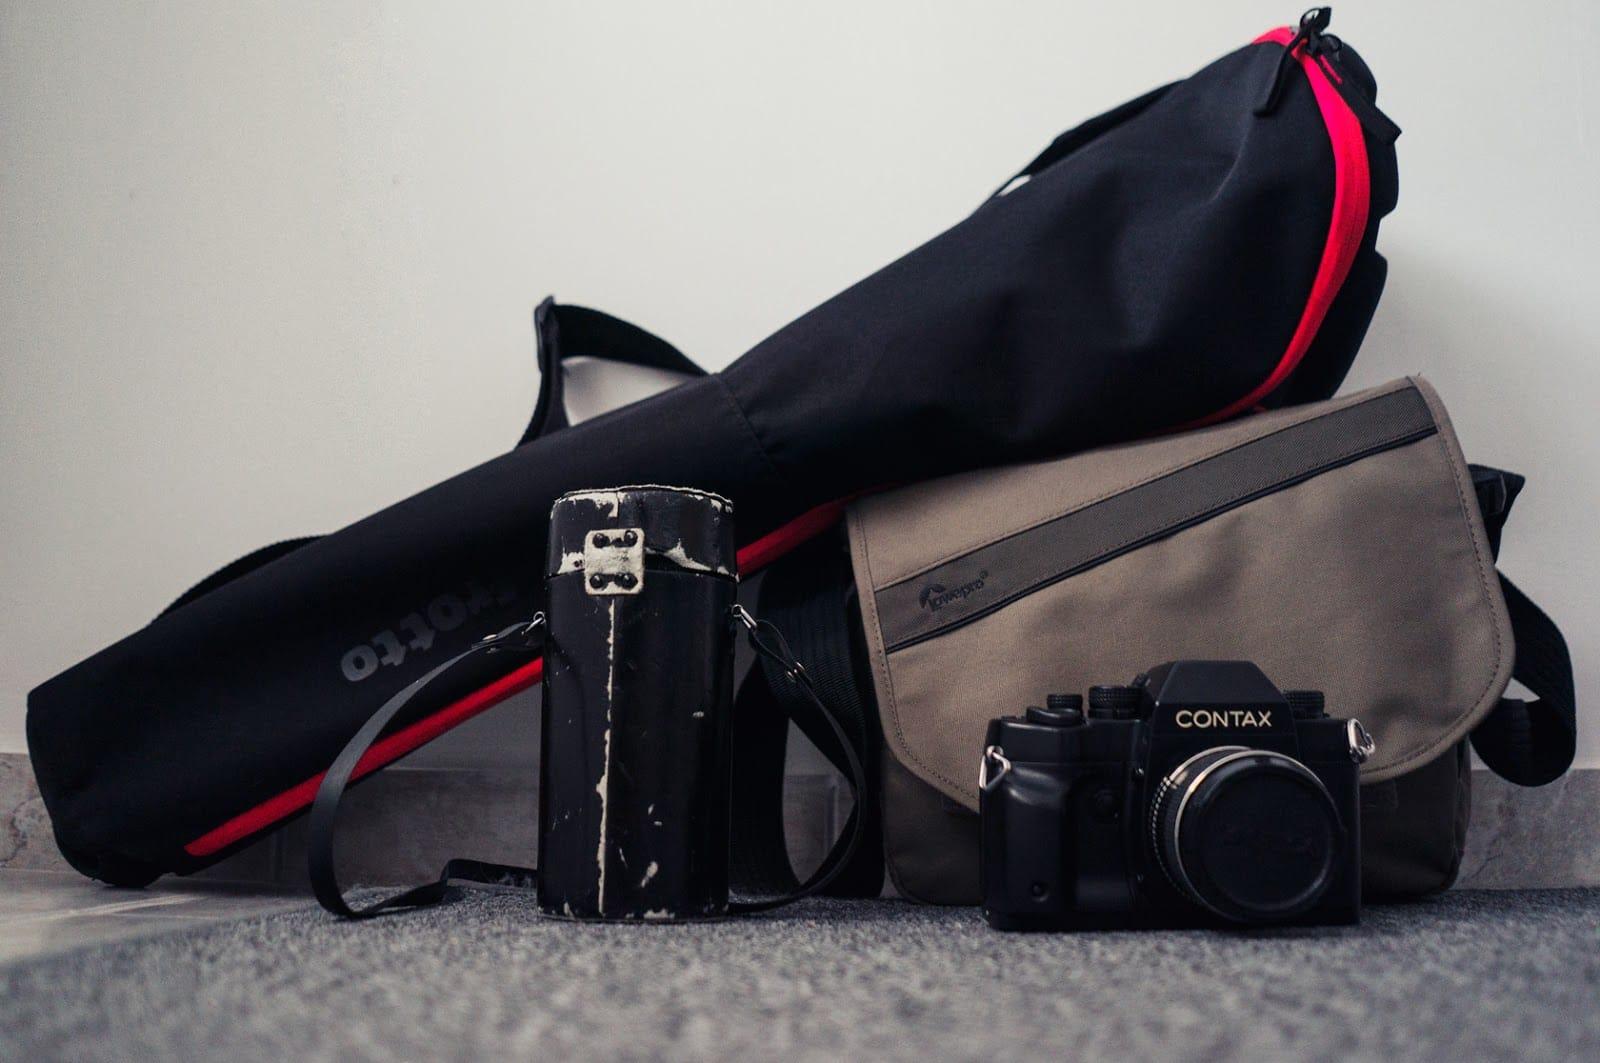 Loads of camera gear and stuff